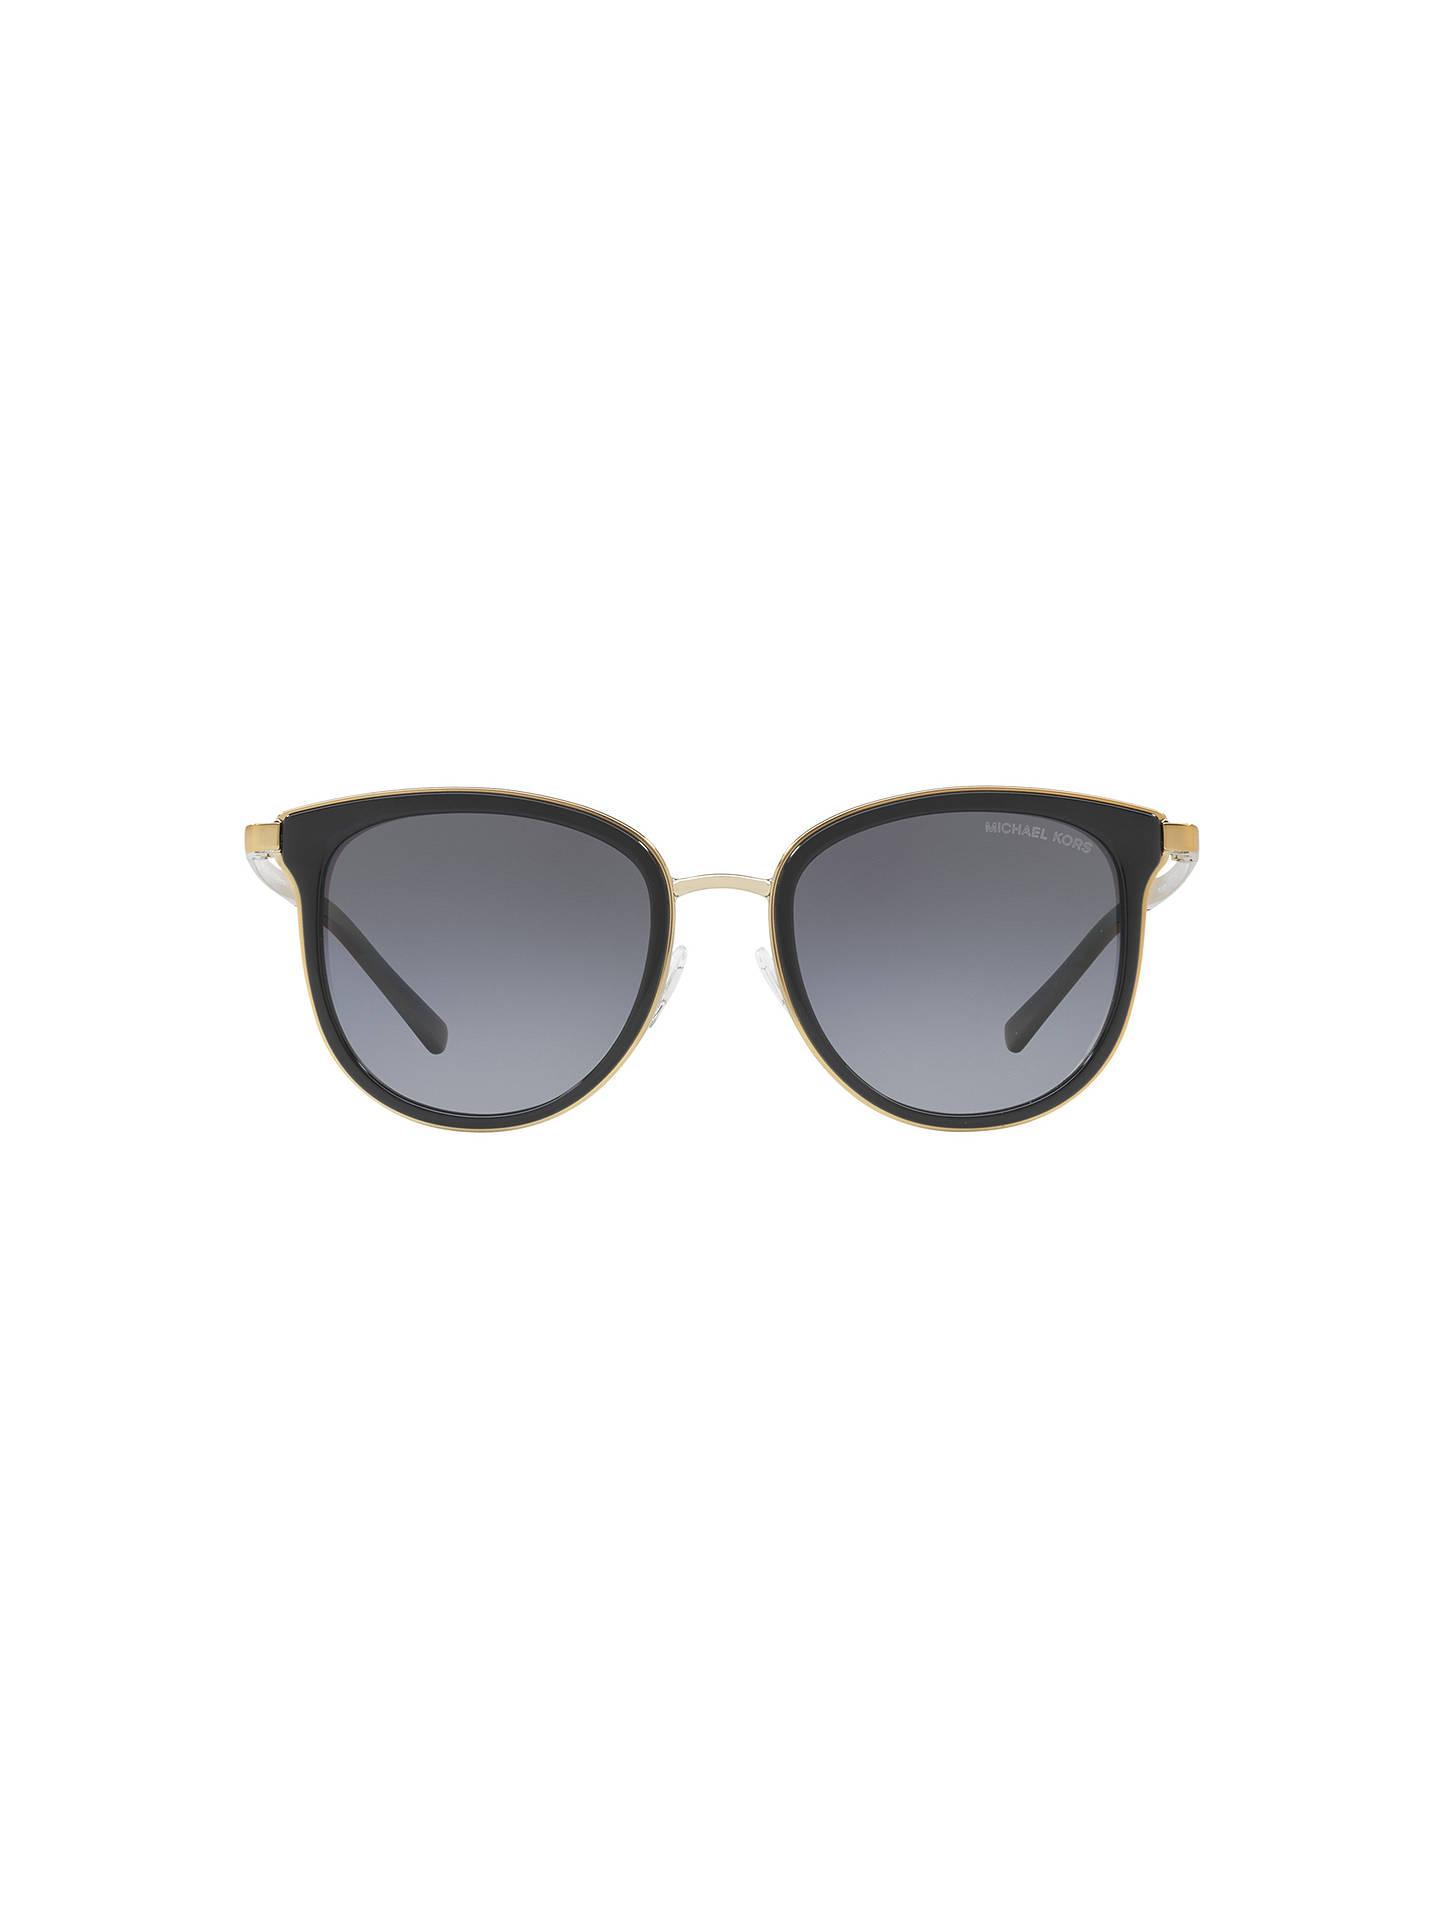 dce954d86a0f9 ... Buy Michael Kors MK1010 Adrianna Polarised Oval Sunglasses